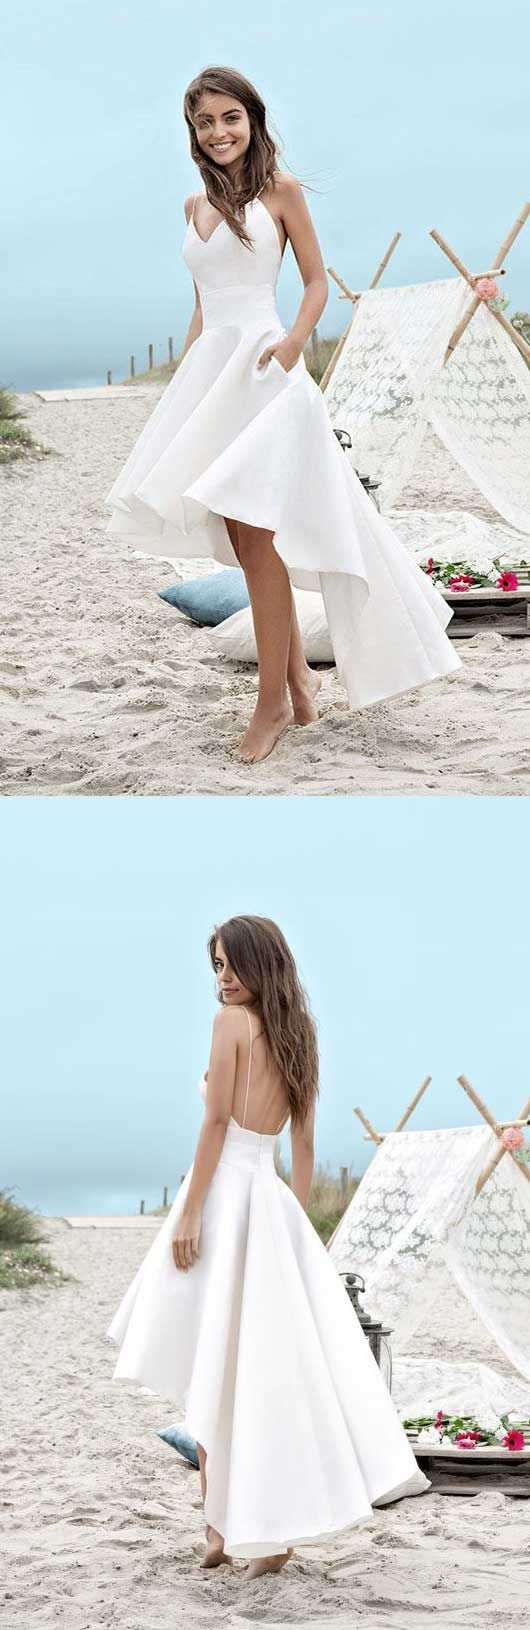 338 best Beach dresses images on Pinterest | Short wedding gowns ...